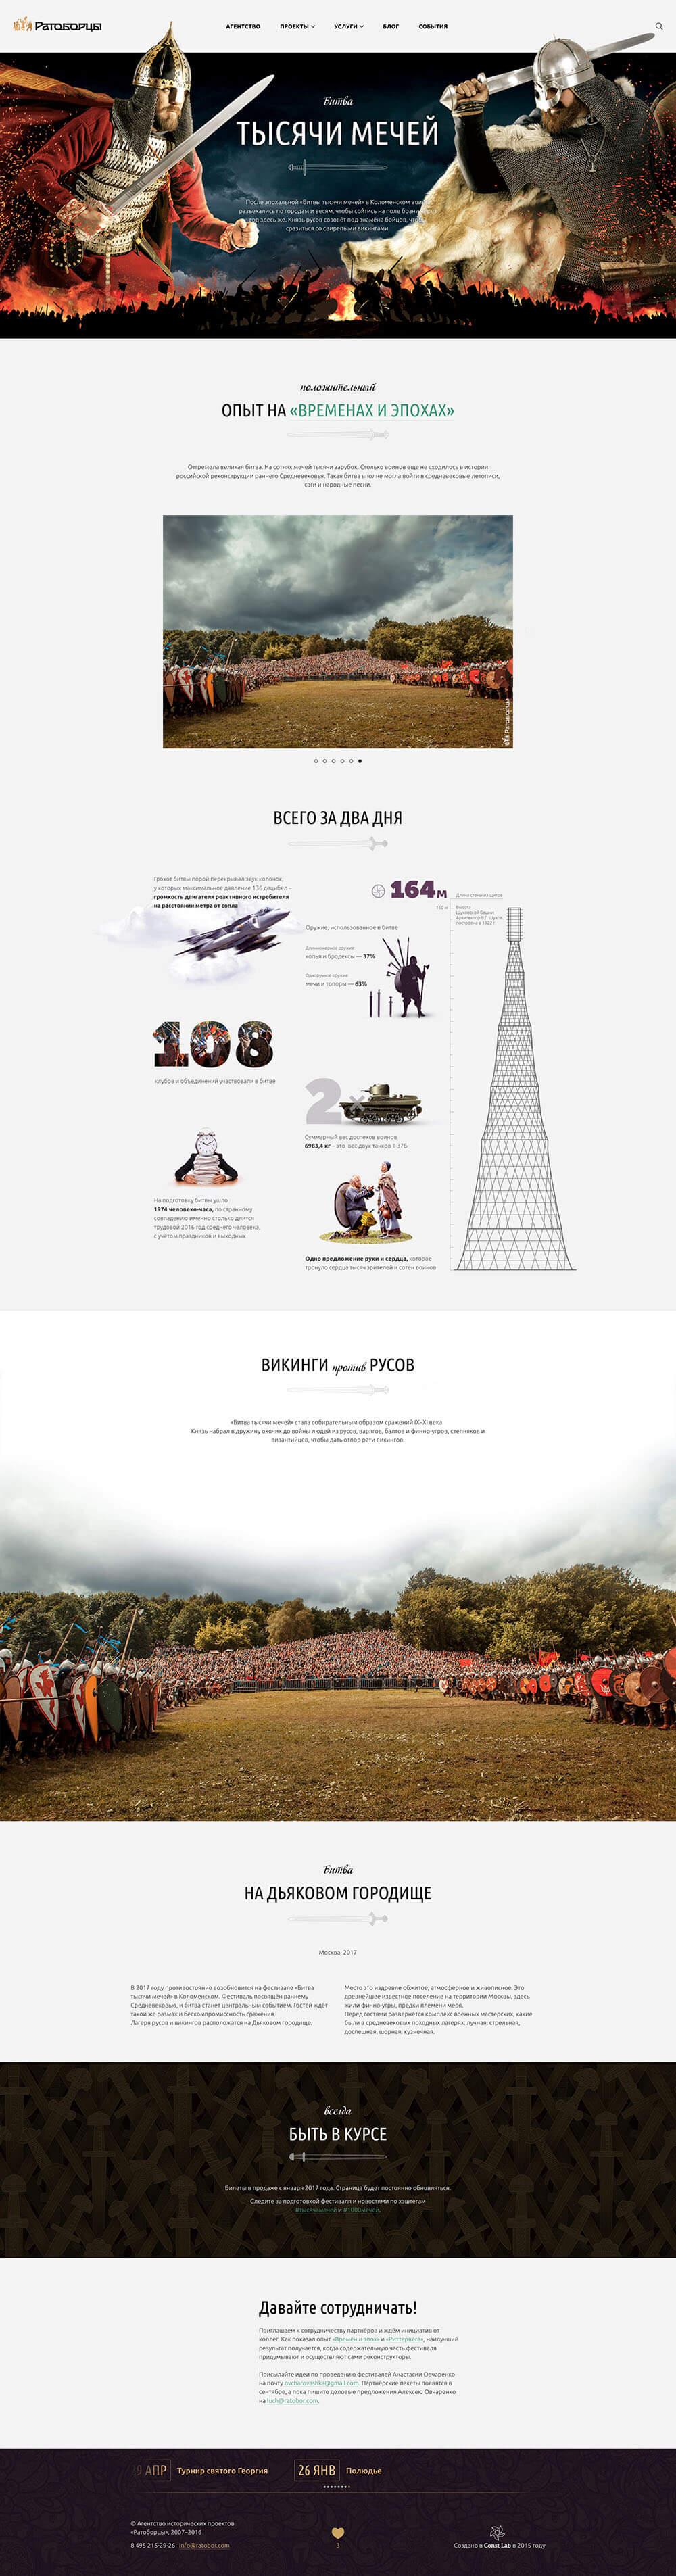 Ратоборцы — страница проекта